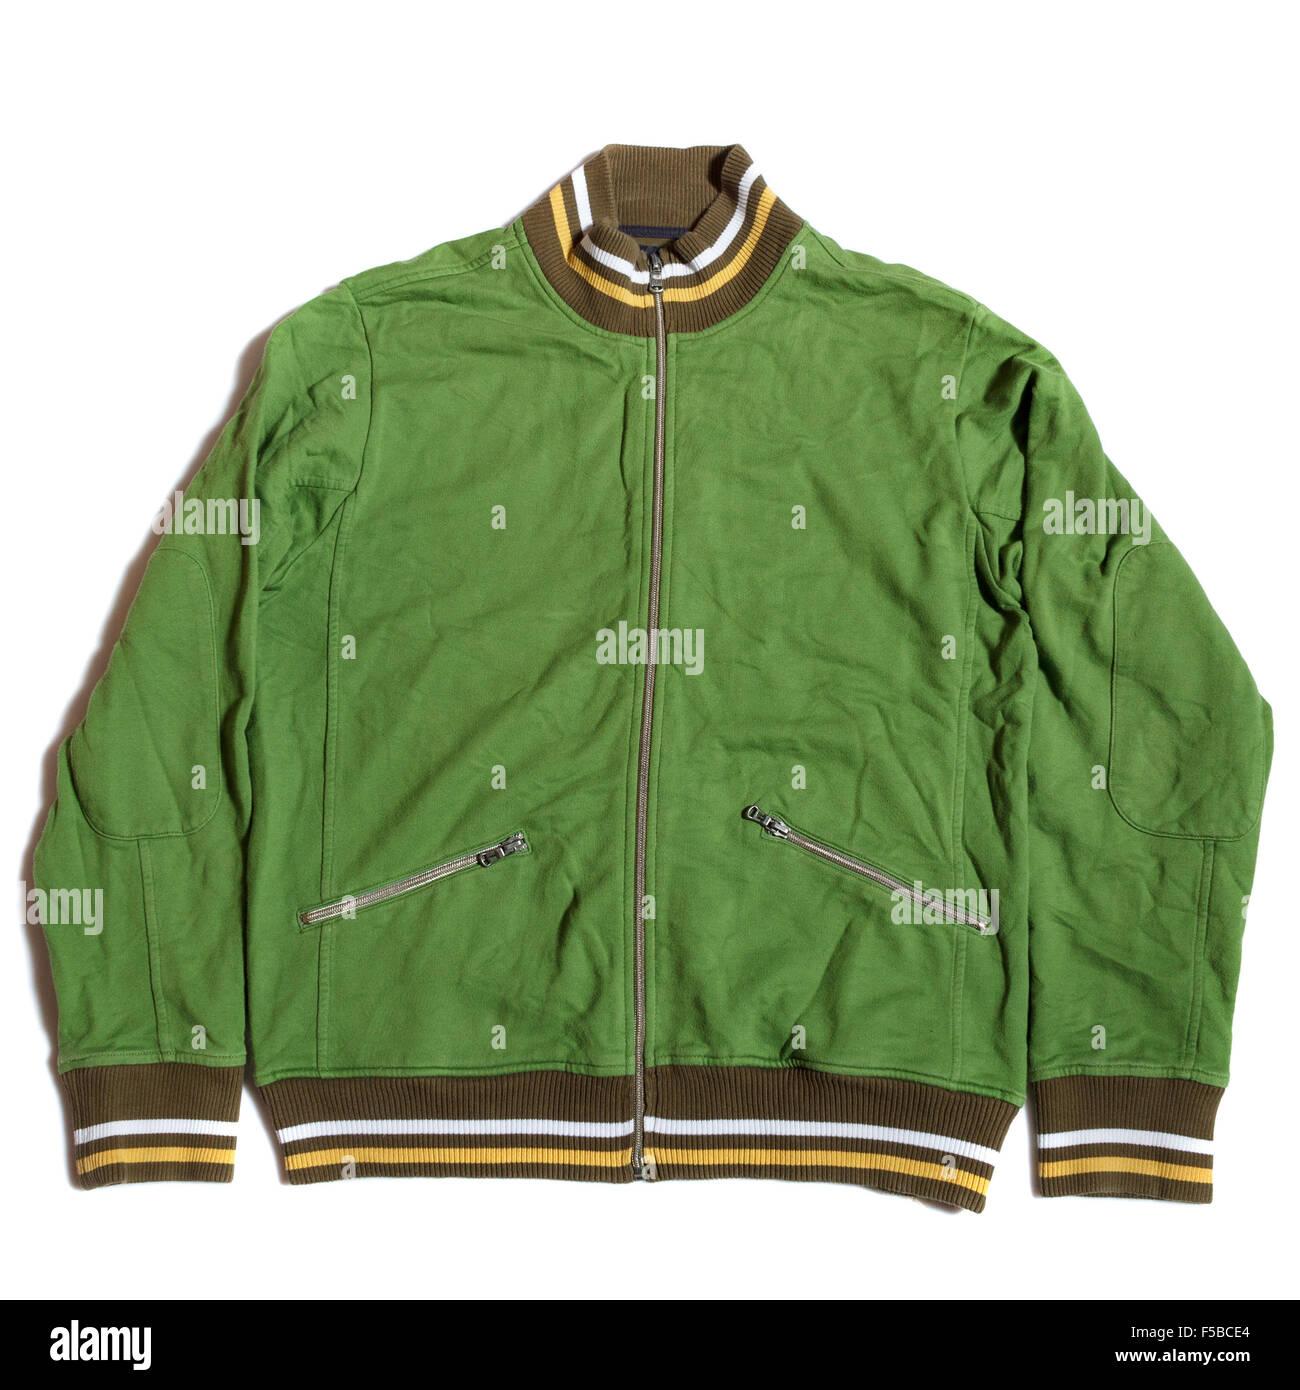 Light green jacket - Stock Image